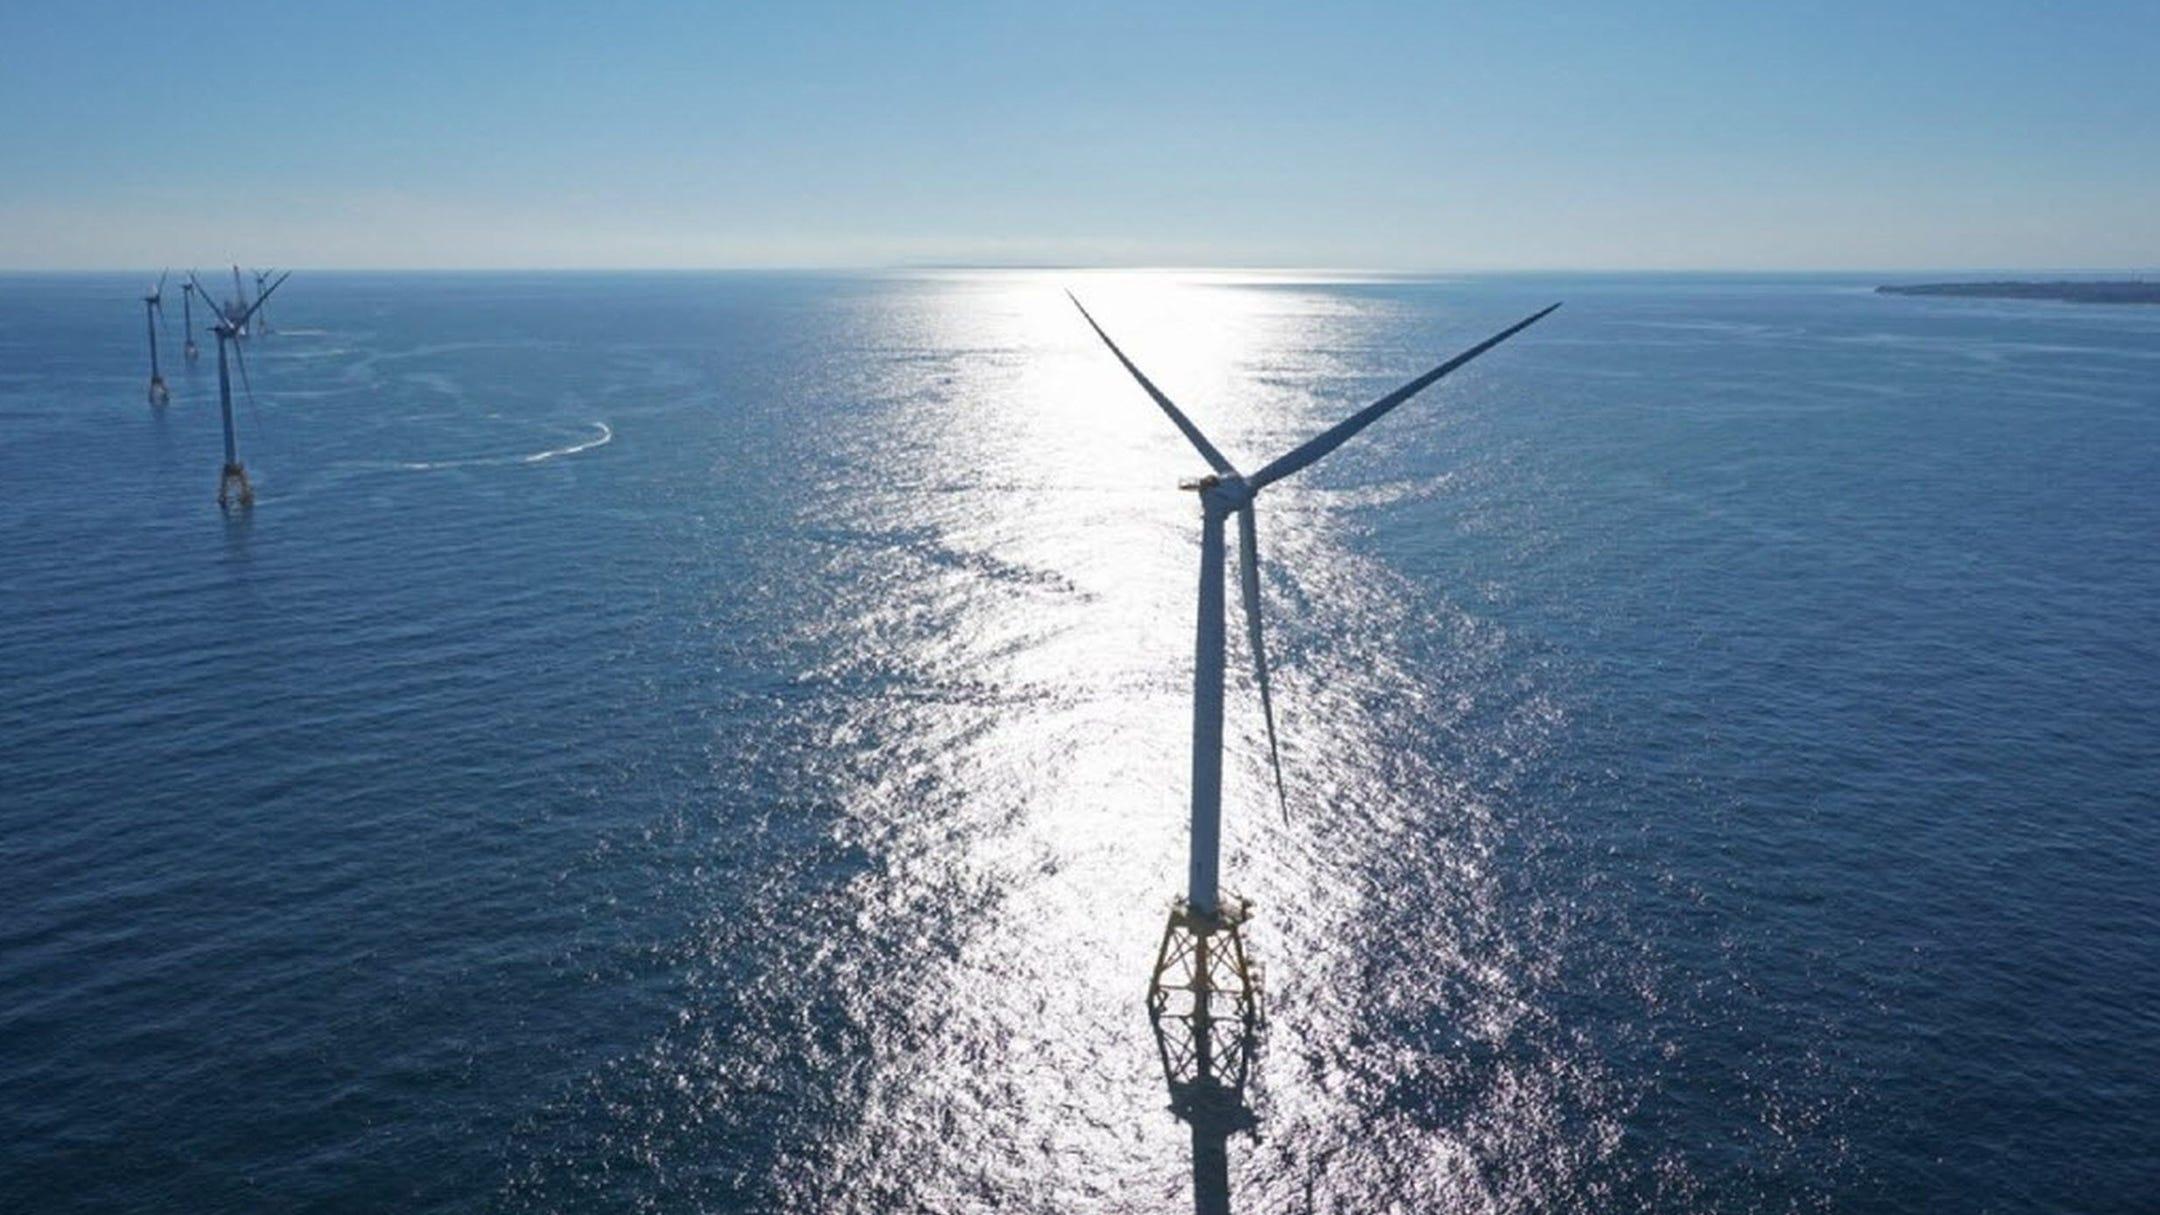 0f59ef7a 1e5e 49c9 97e7 4e04ec4056cb Block Island wind farm JPG?crop=2160,1215,x0,y96&width=2160&height=1215&format=pjpg&auto=webp.